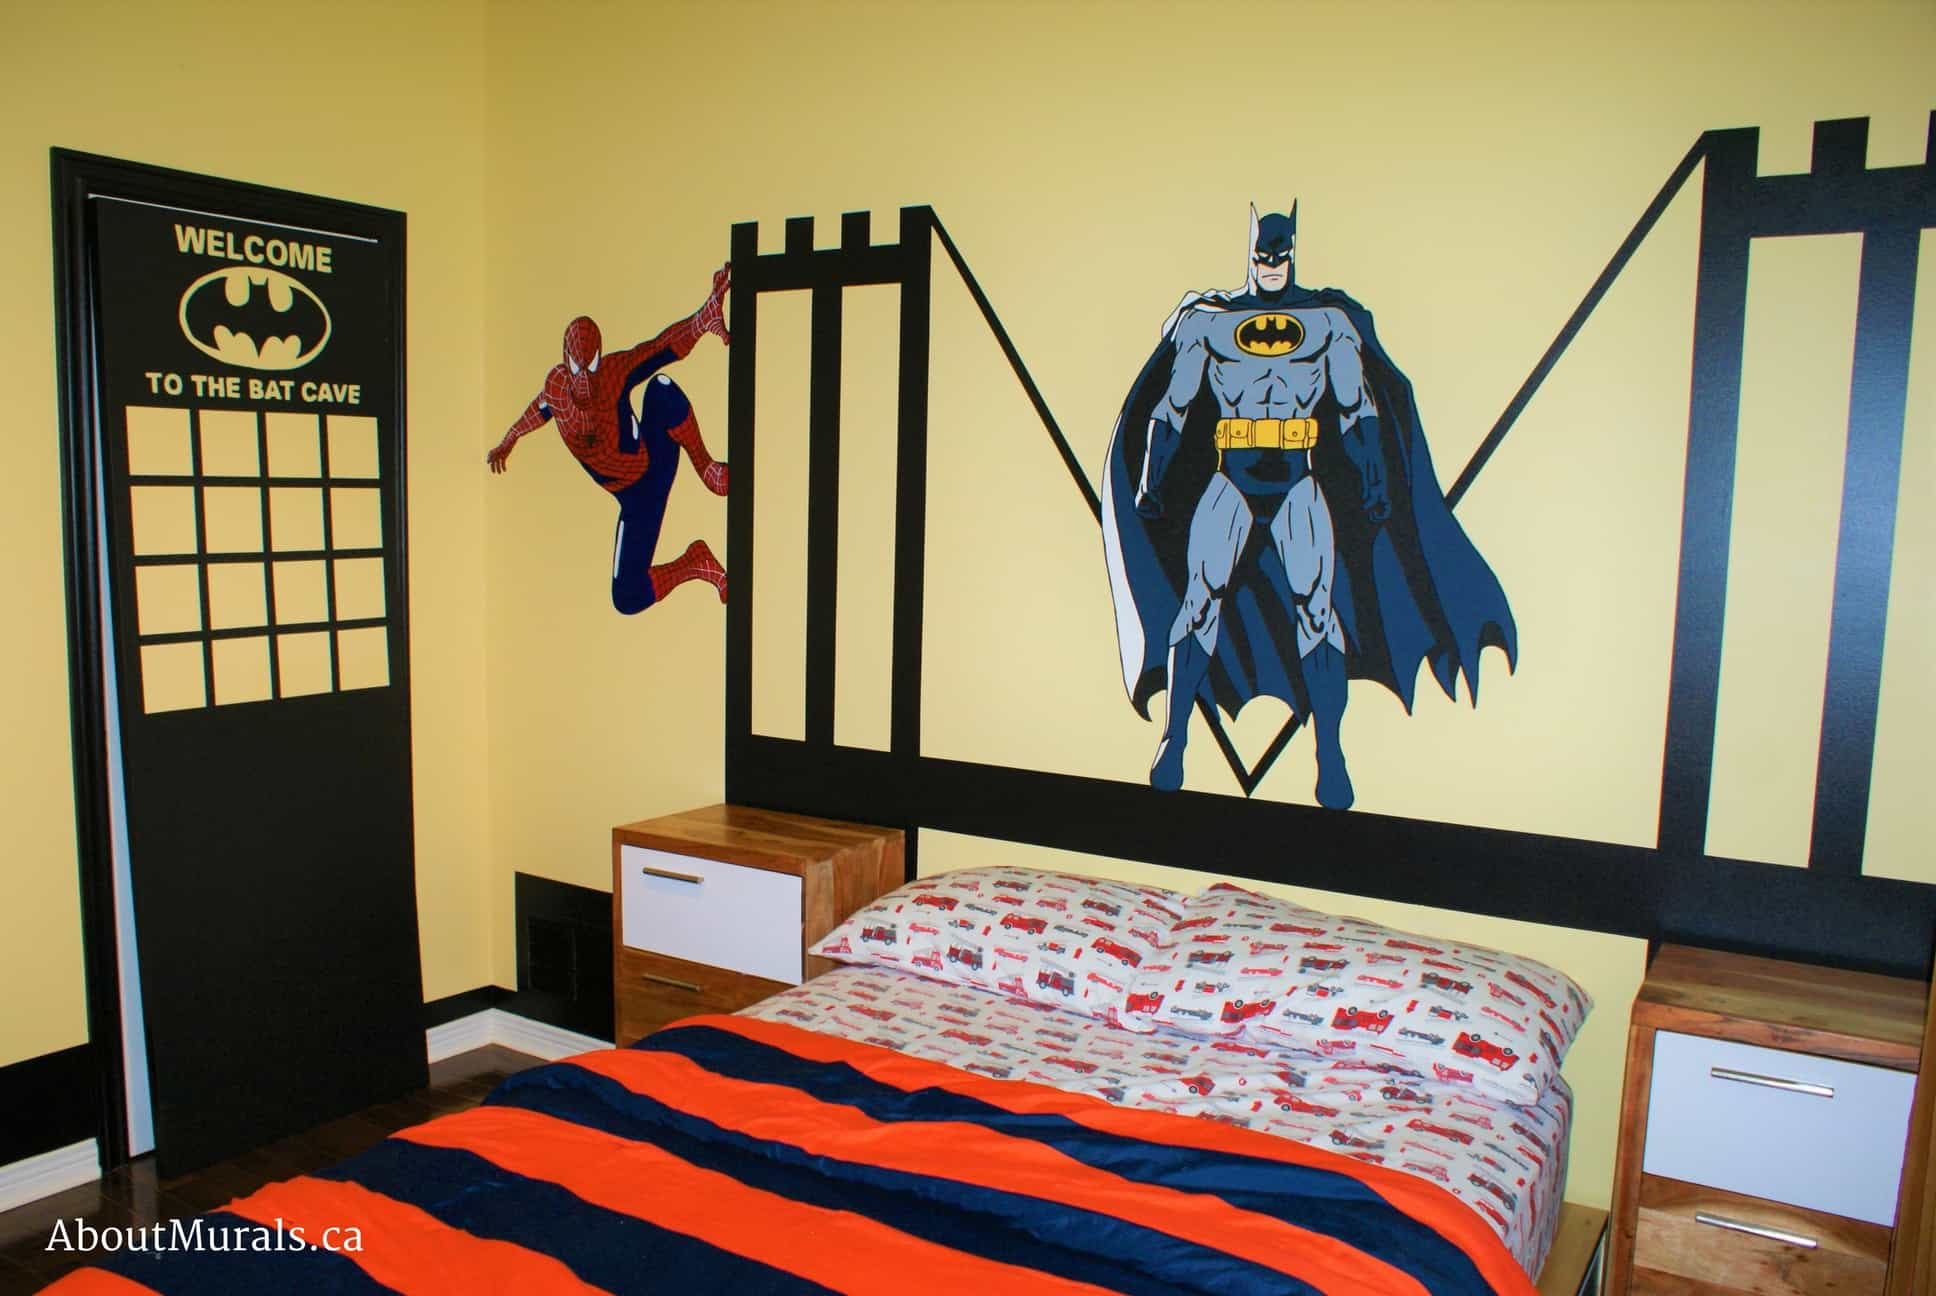 A kids wall mural featuring the superheros Batman and Spiderman